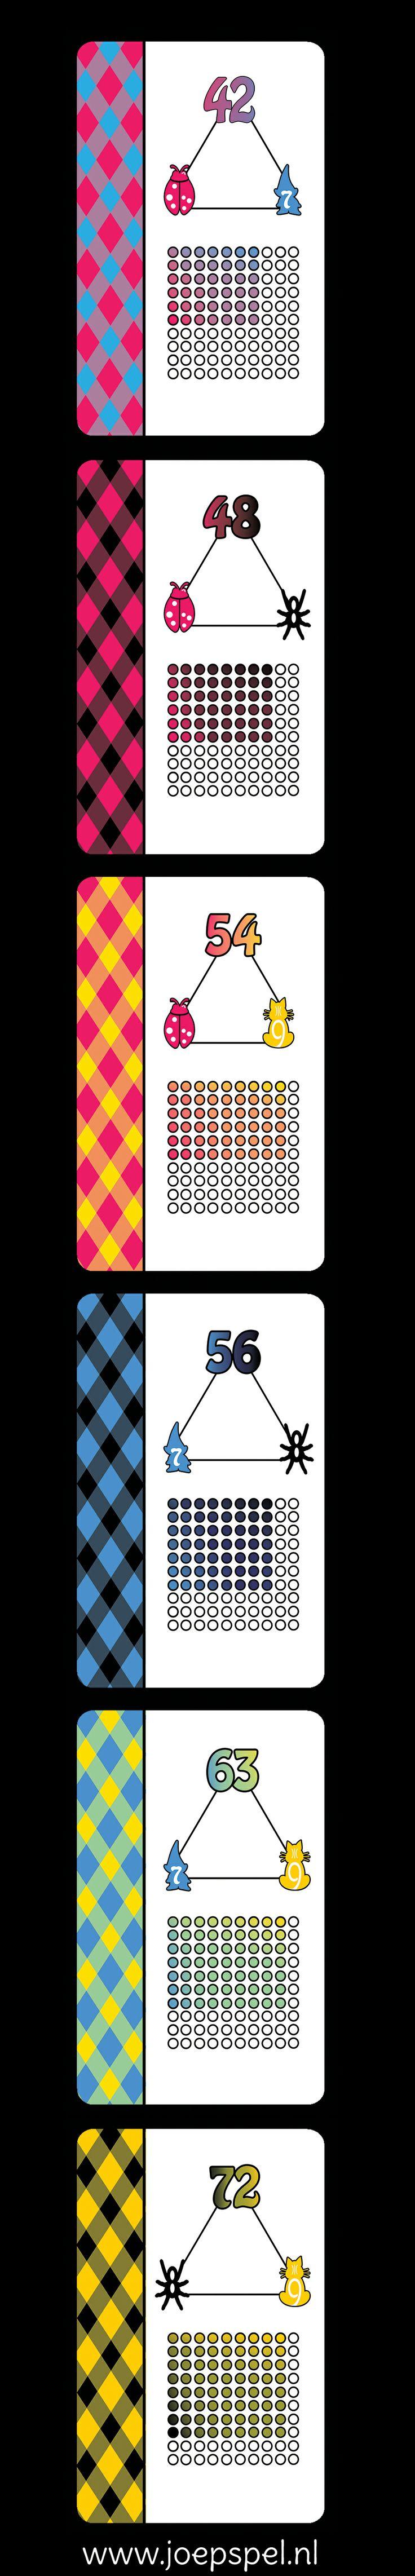 131 best 1x1 images on Pinterest | Math activities, Elementary ...